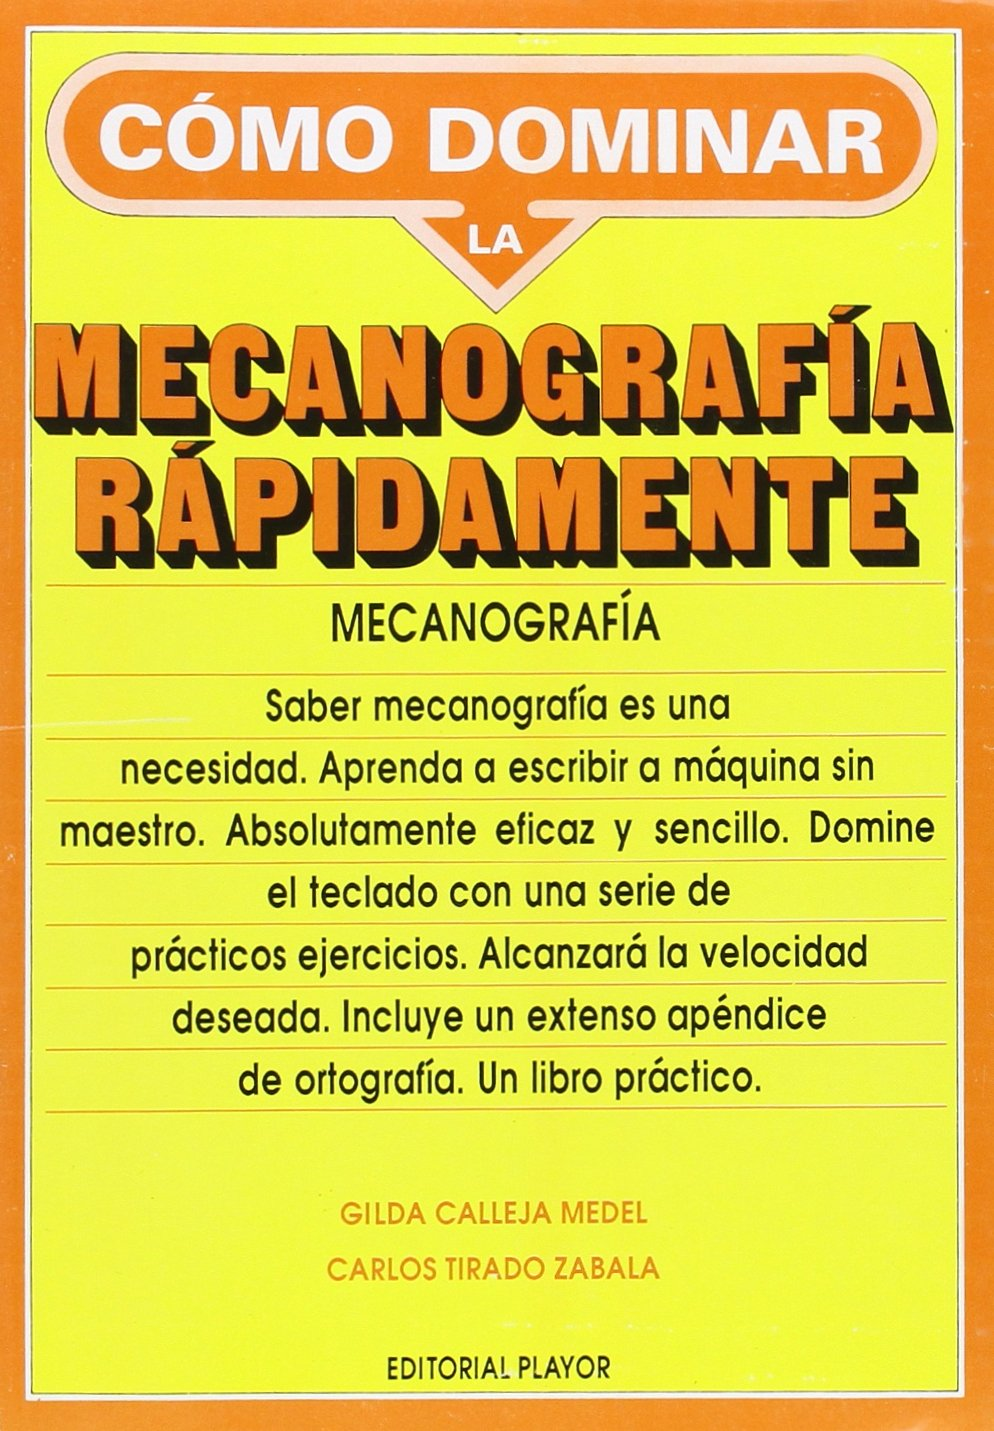 Como Dominar LA Mecanografia en 90 Dias: Gilda Calleja Medel, Carlos Tirado Zabala: 9788435902335: Amazon.com: Books